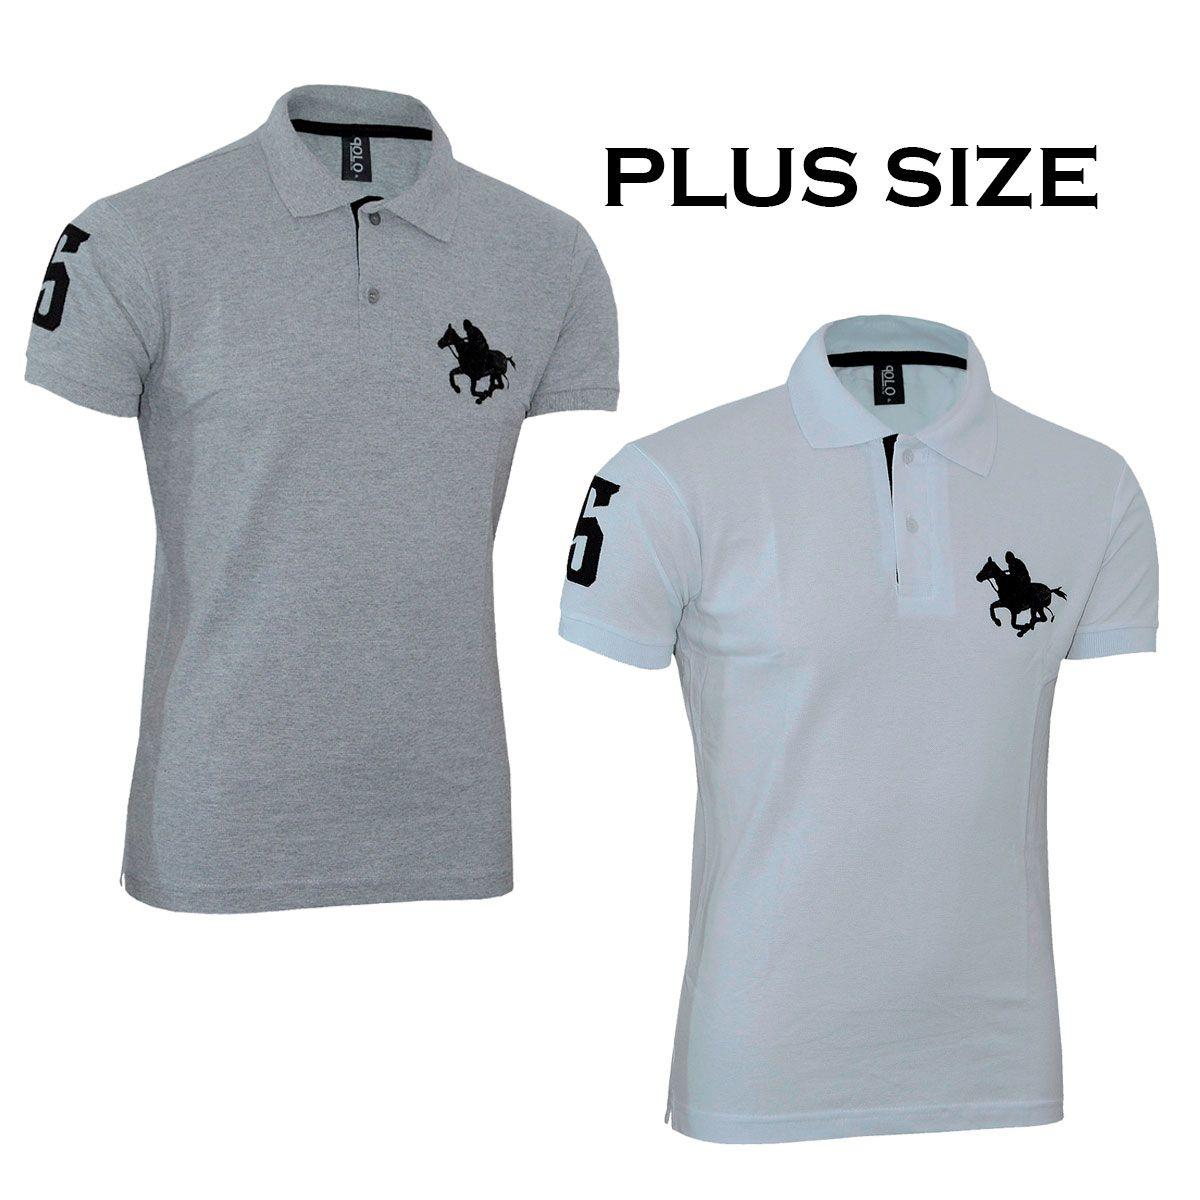 Kit com 02 Polos Tradicionais da Marca Branco e Cinza Plus Size